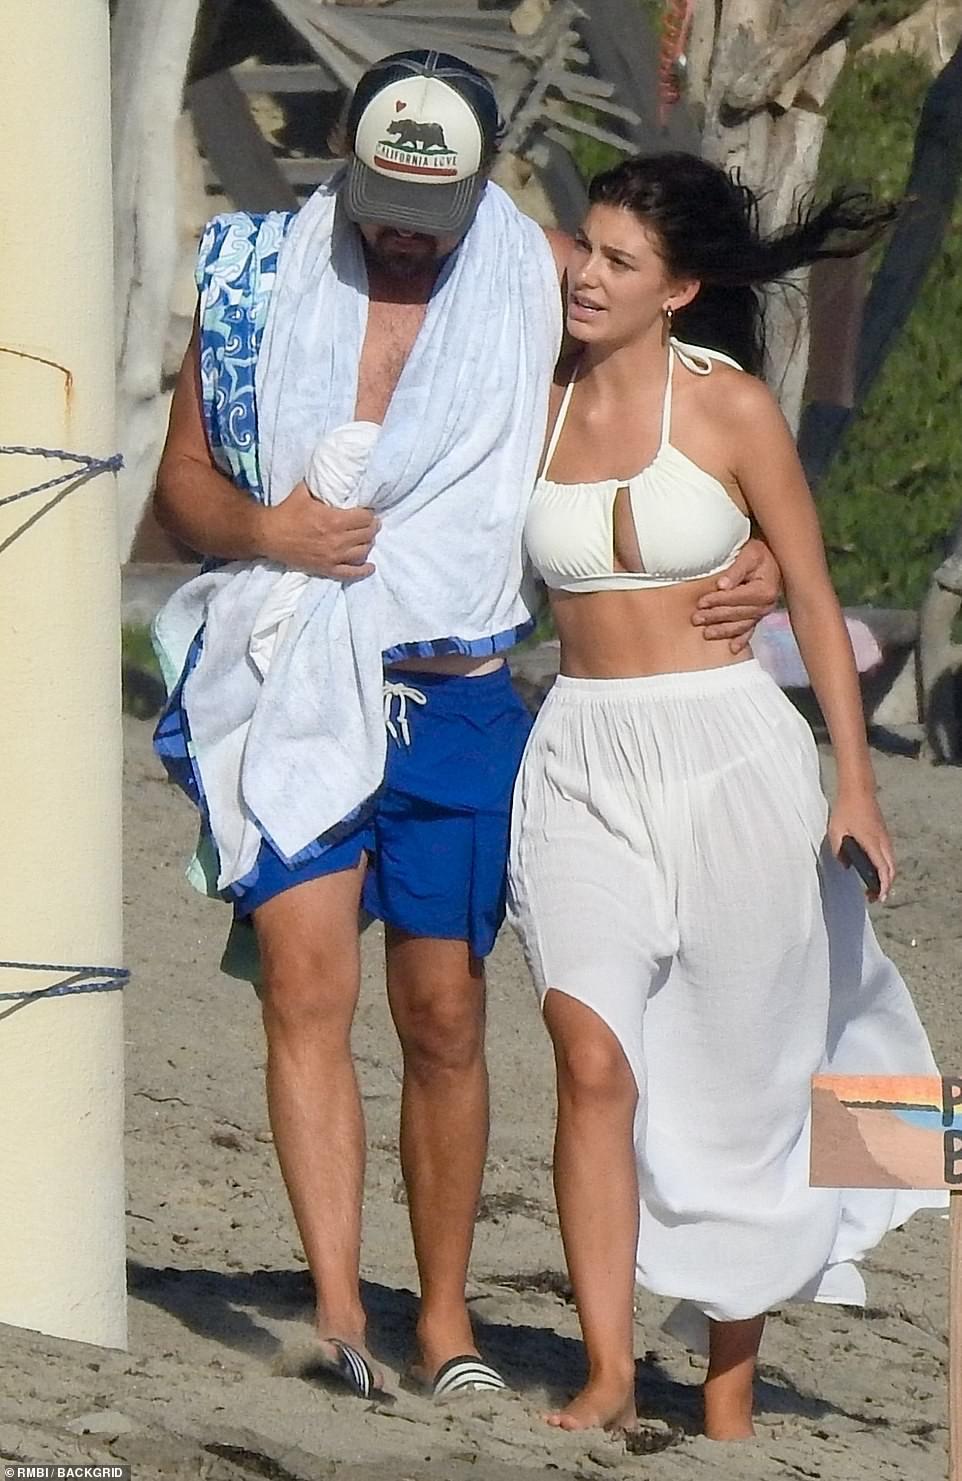 Leonardo DiCaprio, 45, wraps his arms around 23 year old girlfriend, Camila Morrone, while holidaying in Malibu (photos)??